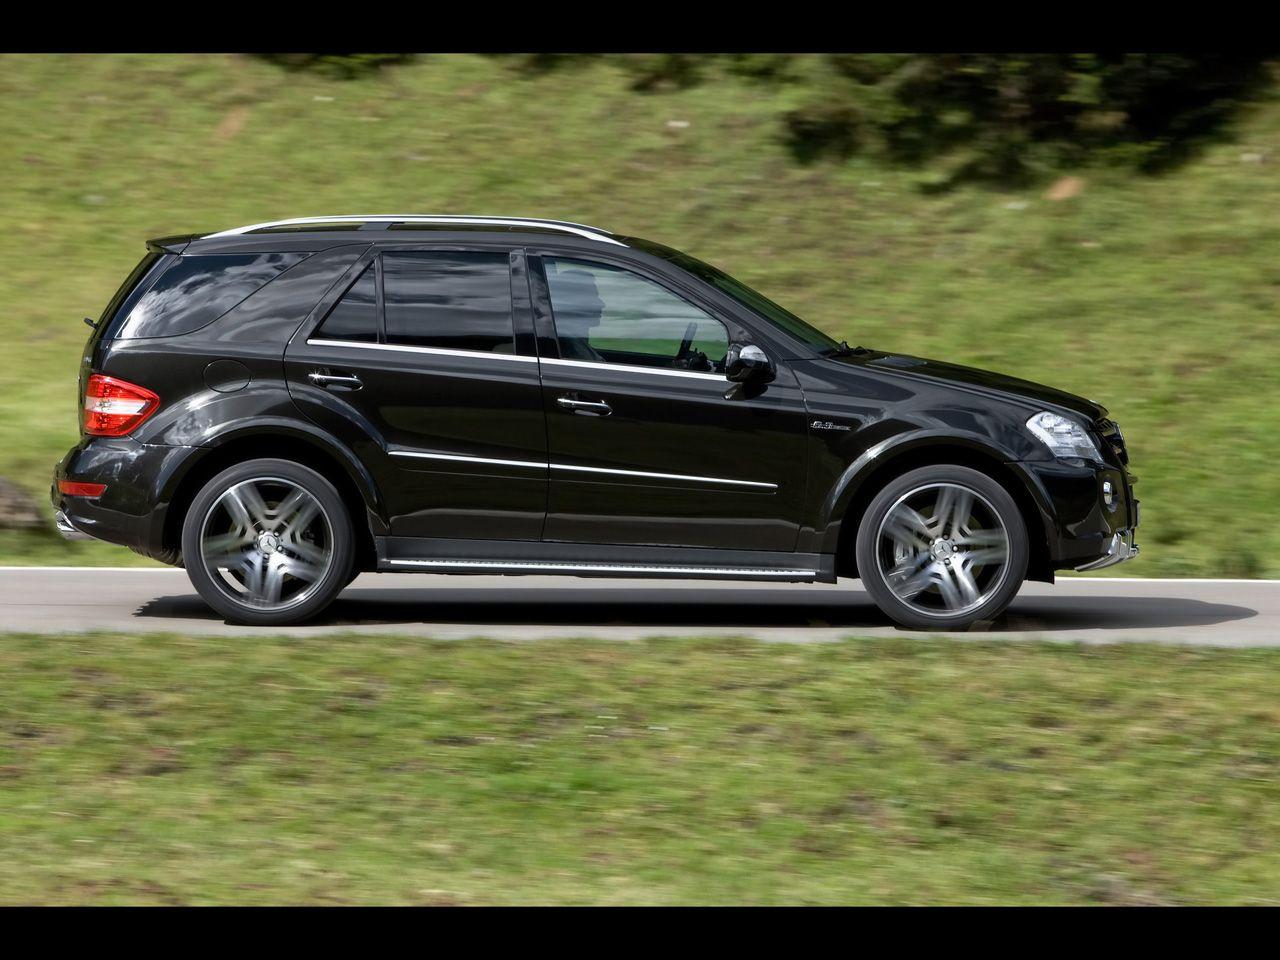 Mercedes ml 63 amg by brabus custom cars pinterest mercedes benz custom cars and luxury suv